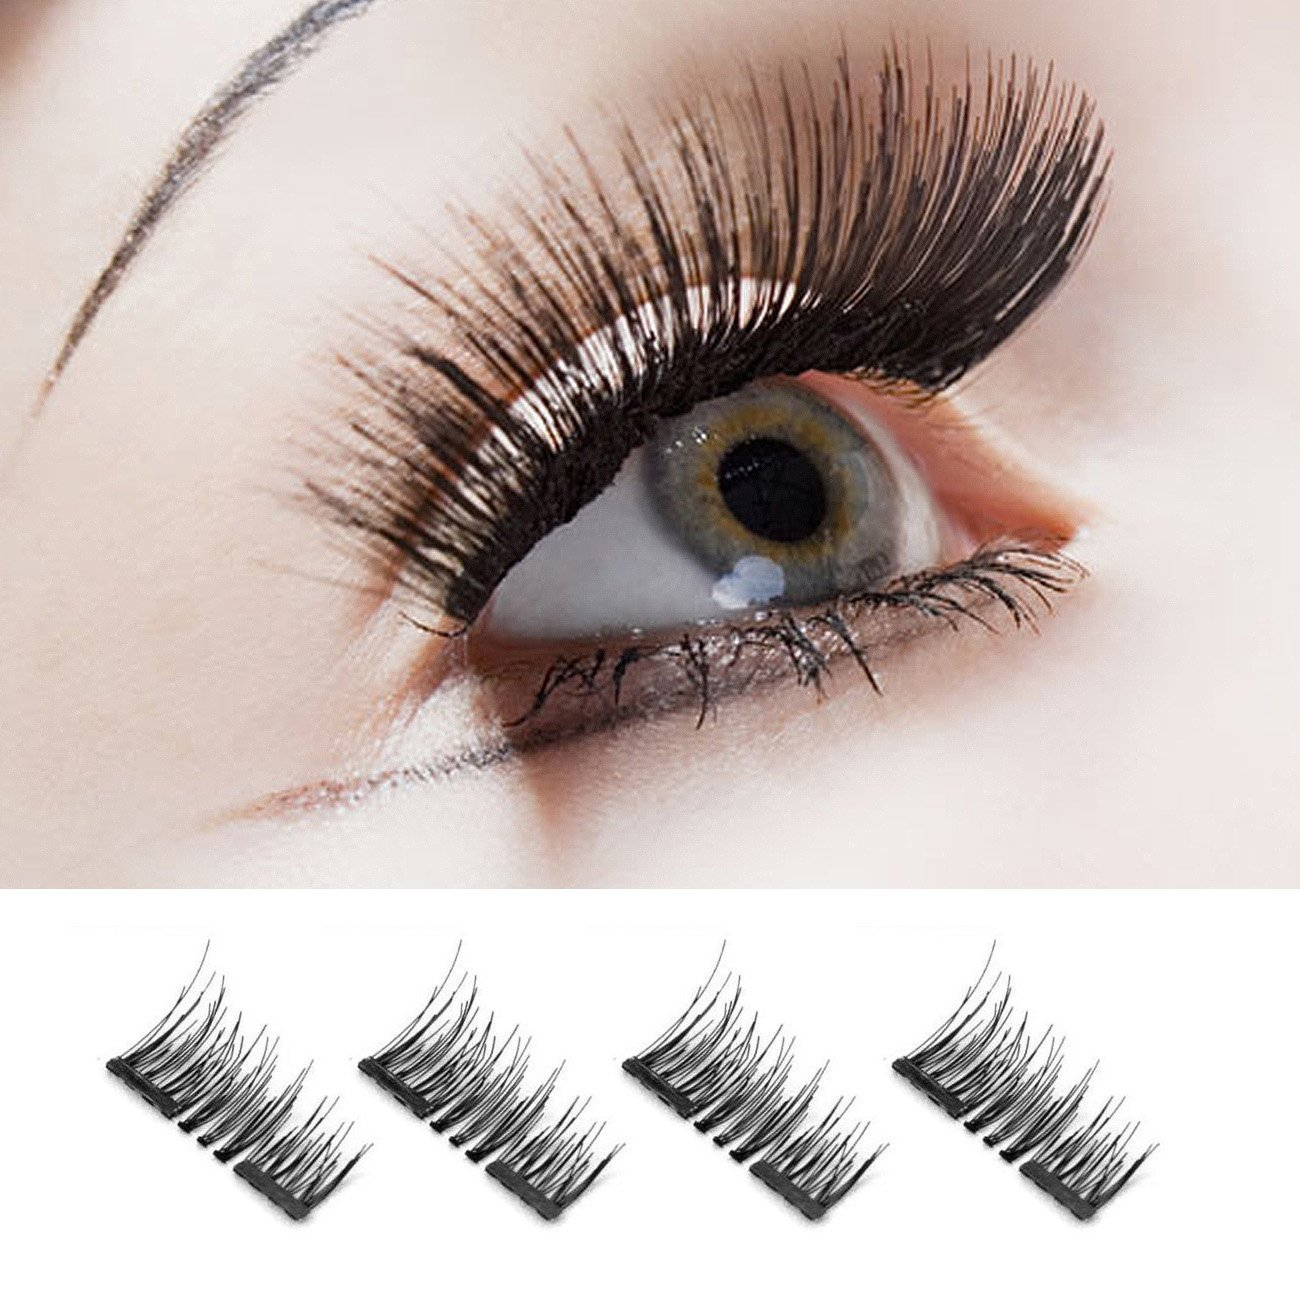 16d9ff8592e Get Quotations · False Eyelashes and Adhesives Magnetic Fake Eyelashes 3D  Double Magnets Fake Eyelashes Reusable False Eyelashes Pack